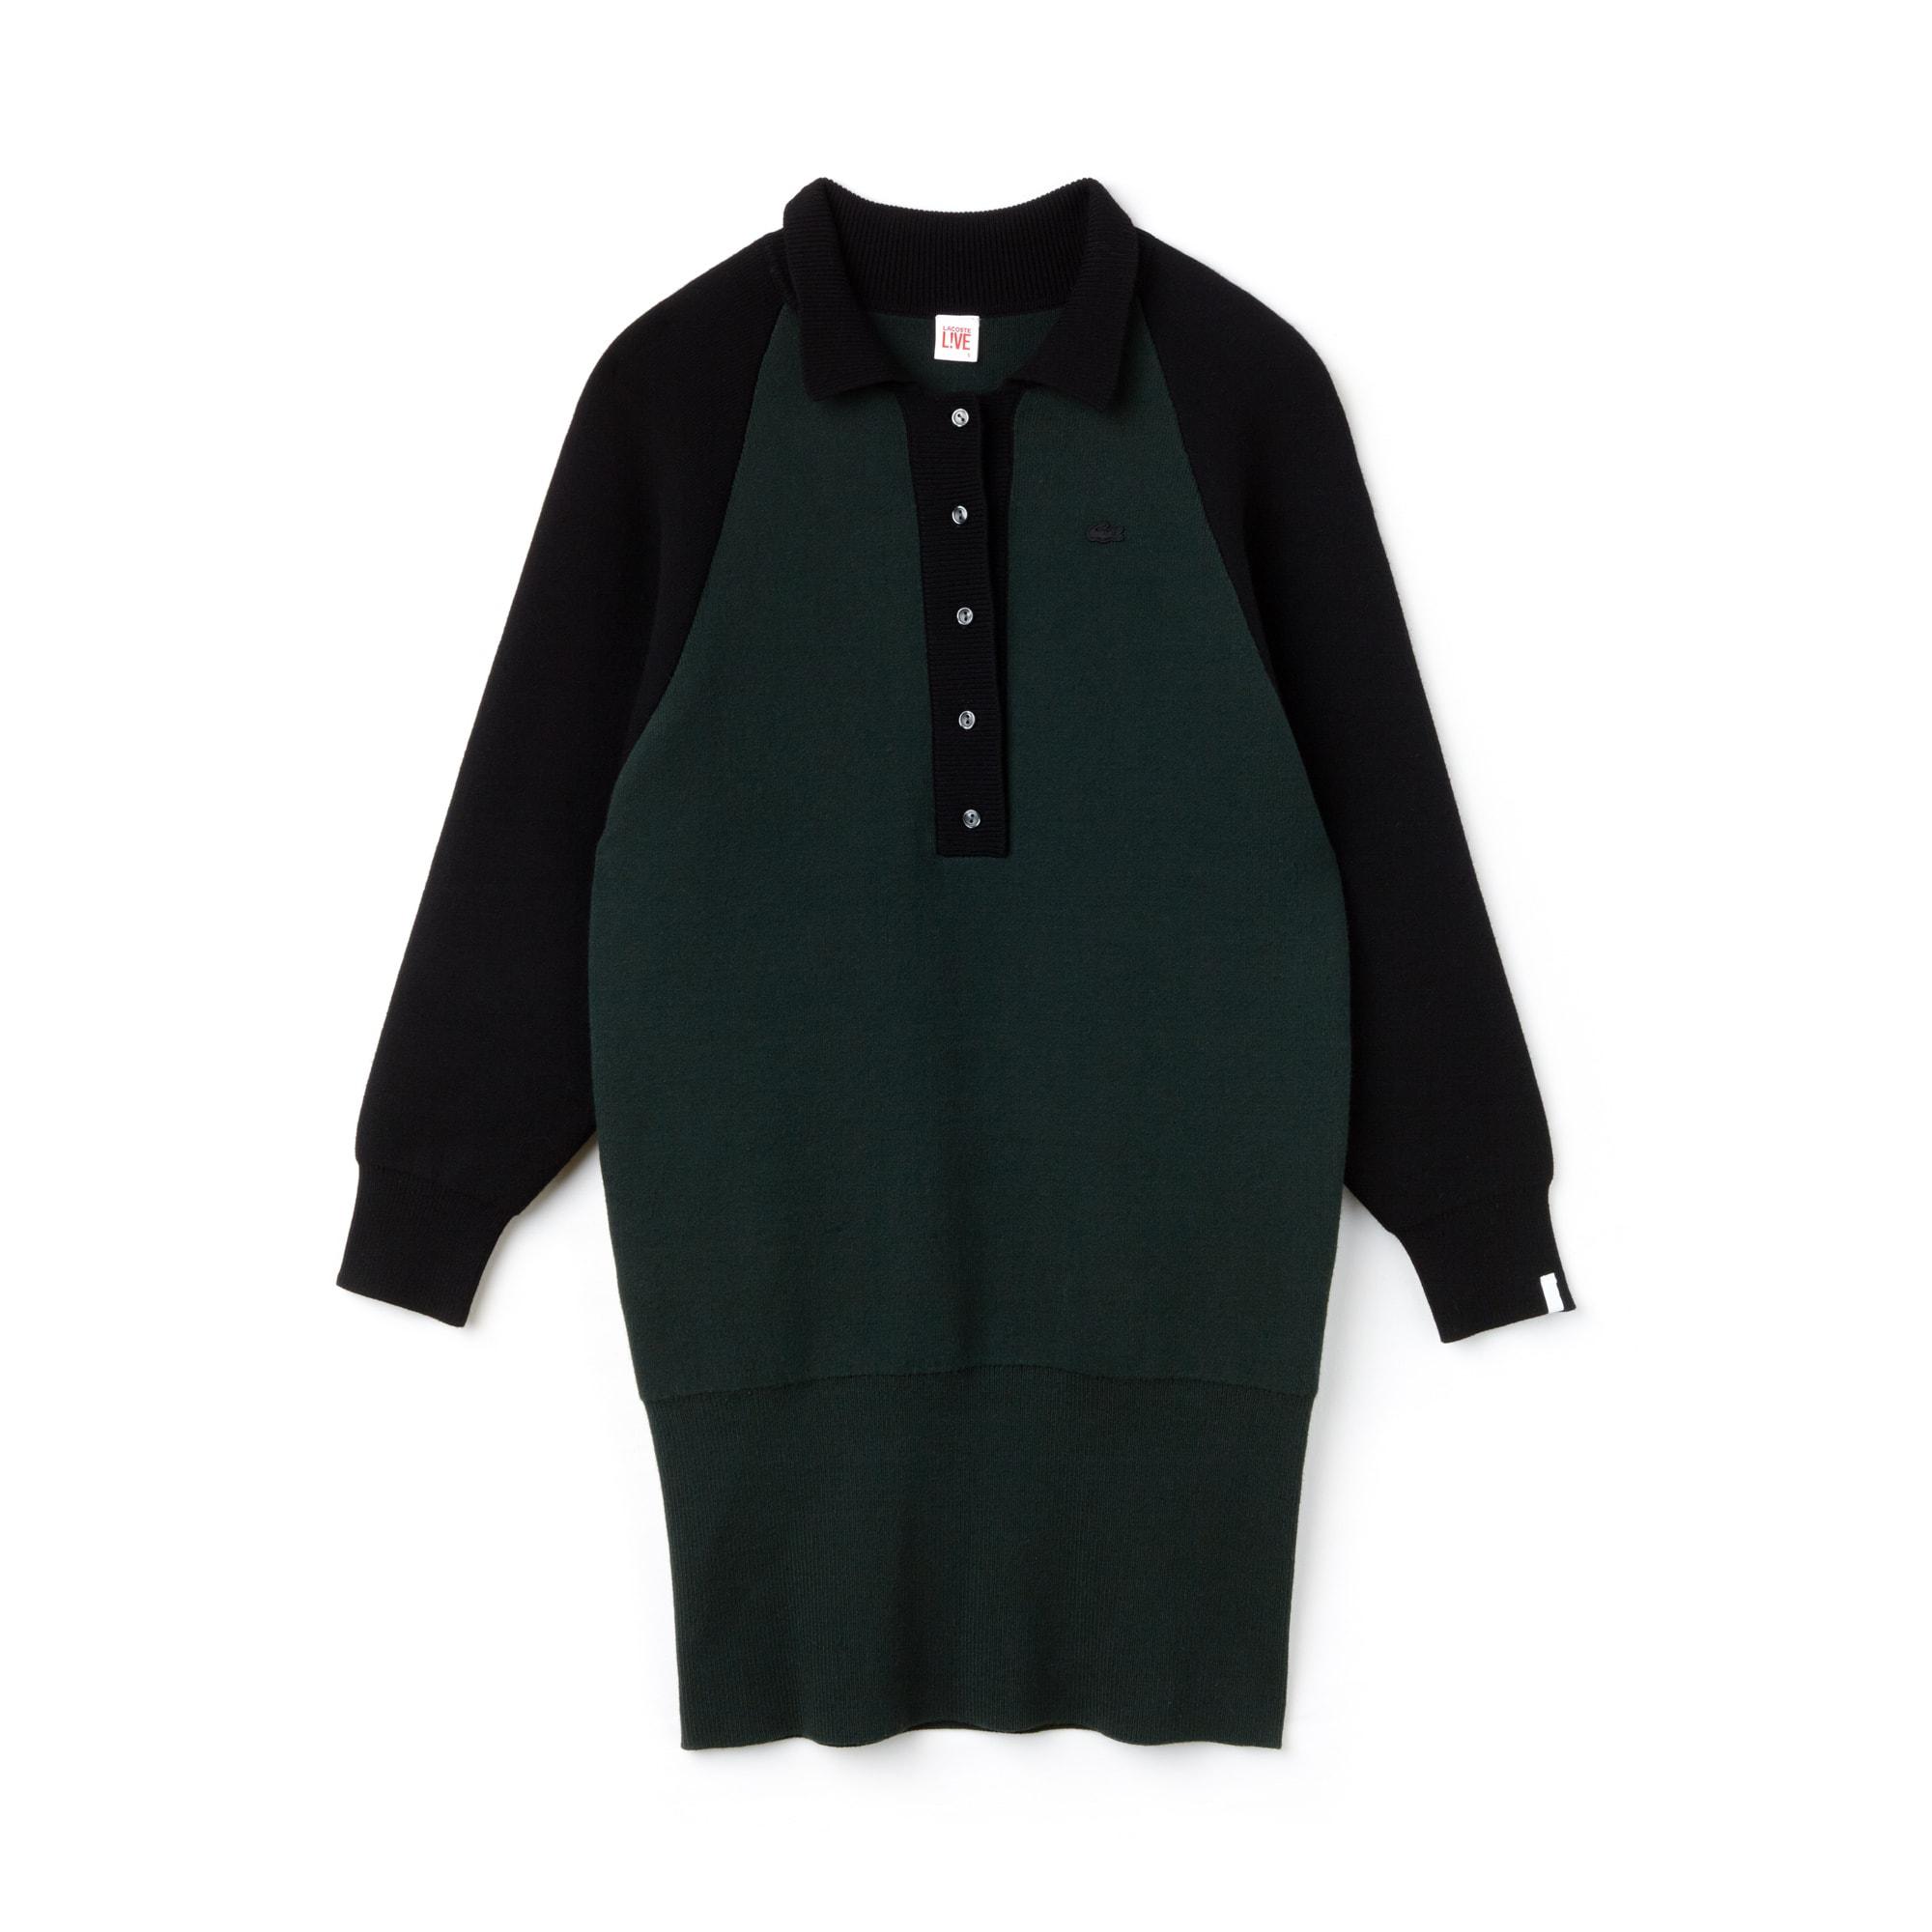 Lacoste LIVE系列双层色块拼接平纹针织面料女士运动衫式连身裙